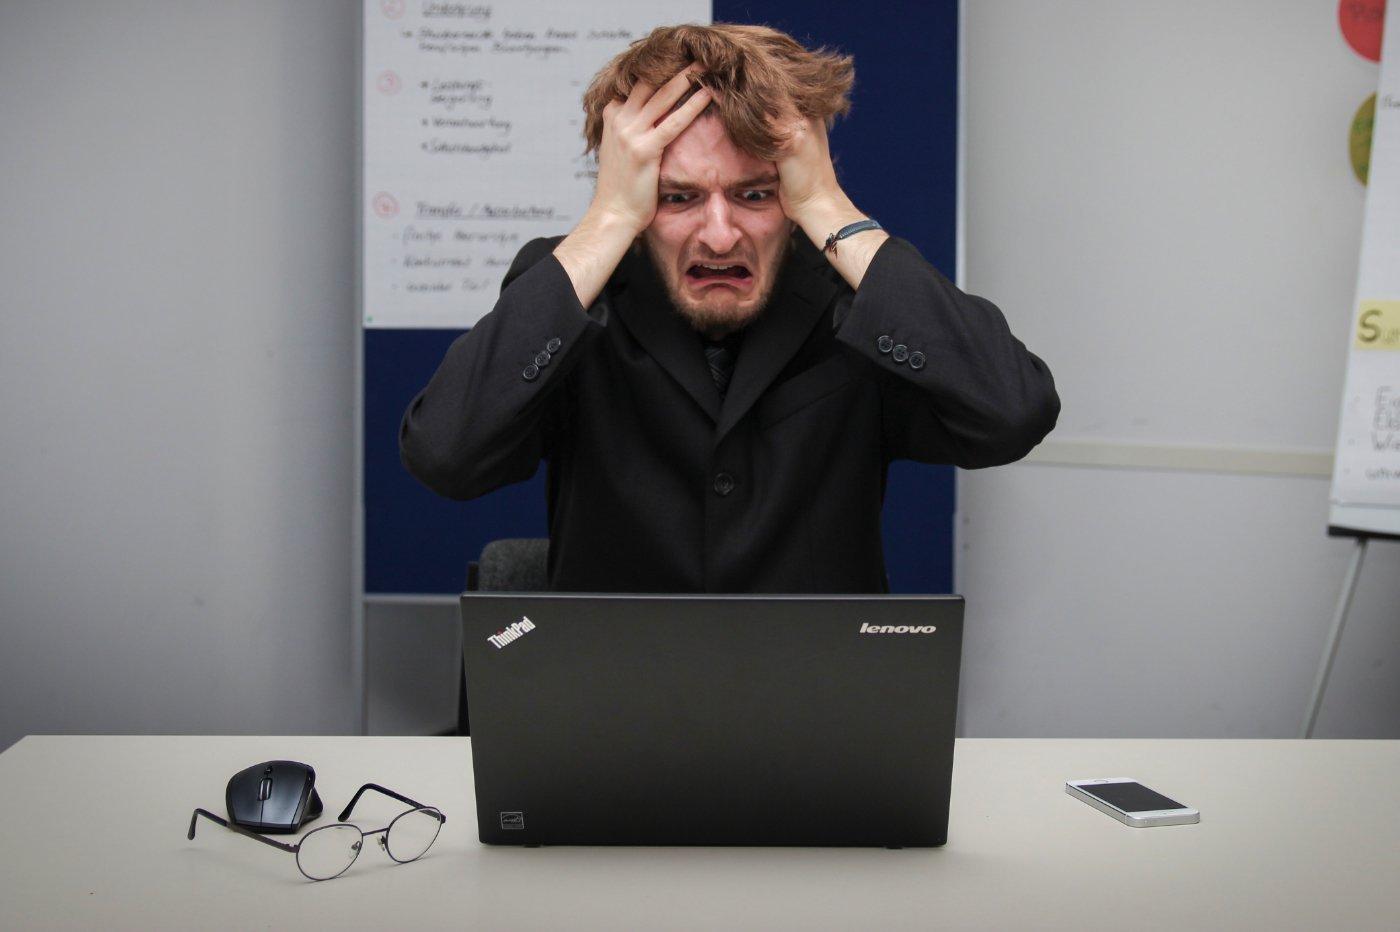 Malware ordinateur